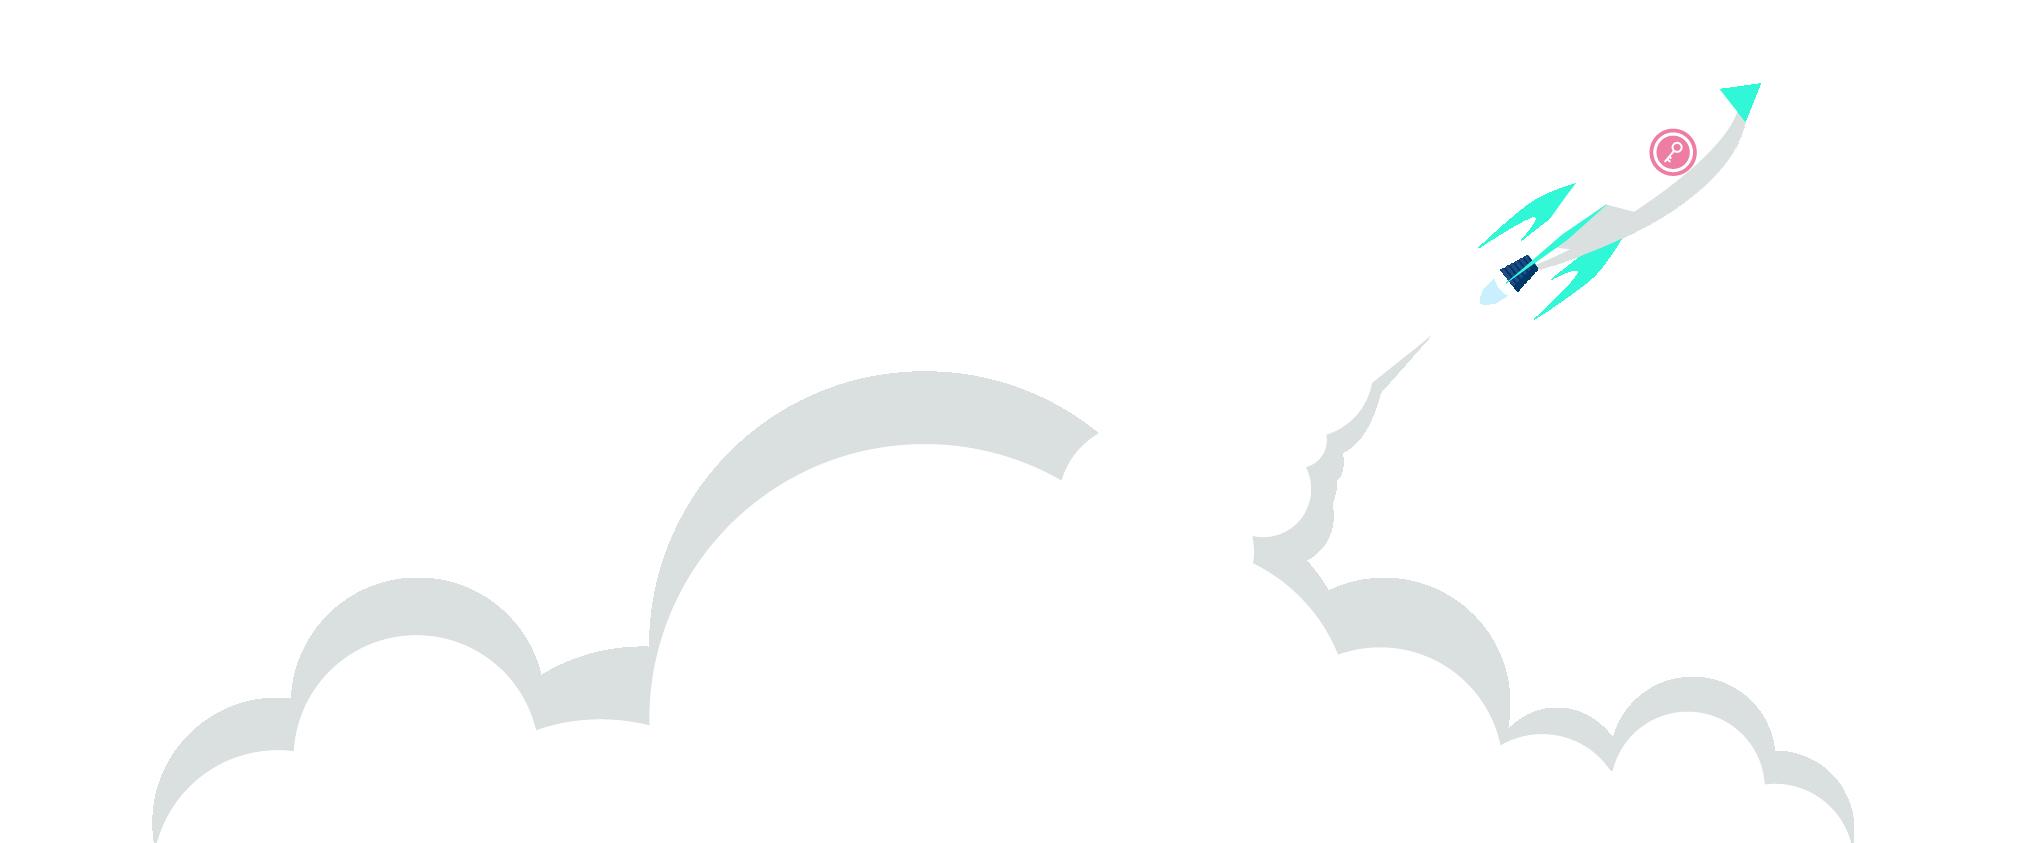 Picnic rocket - fast